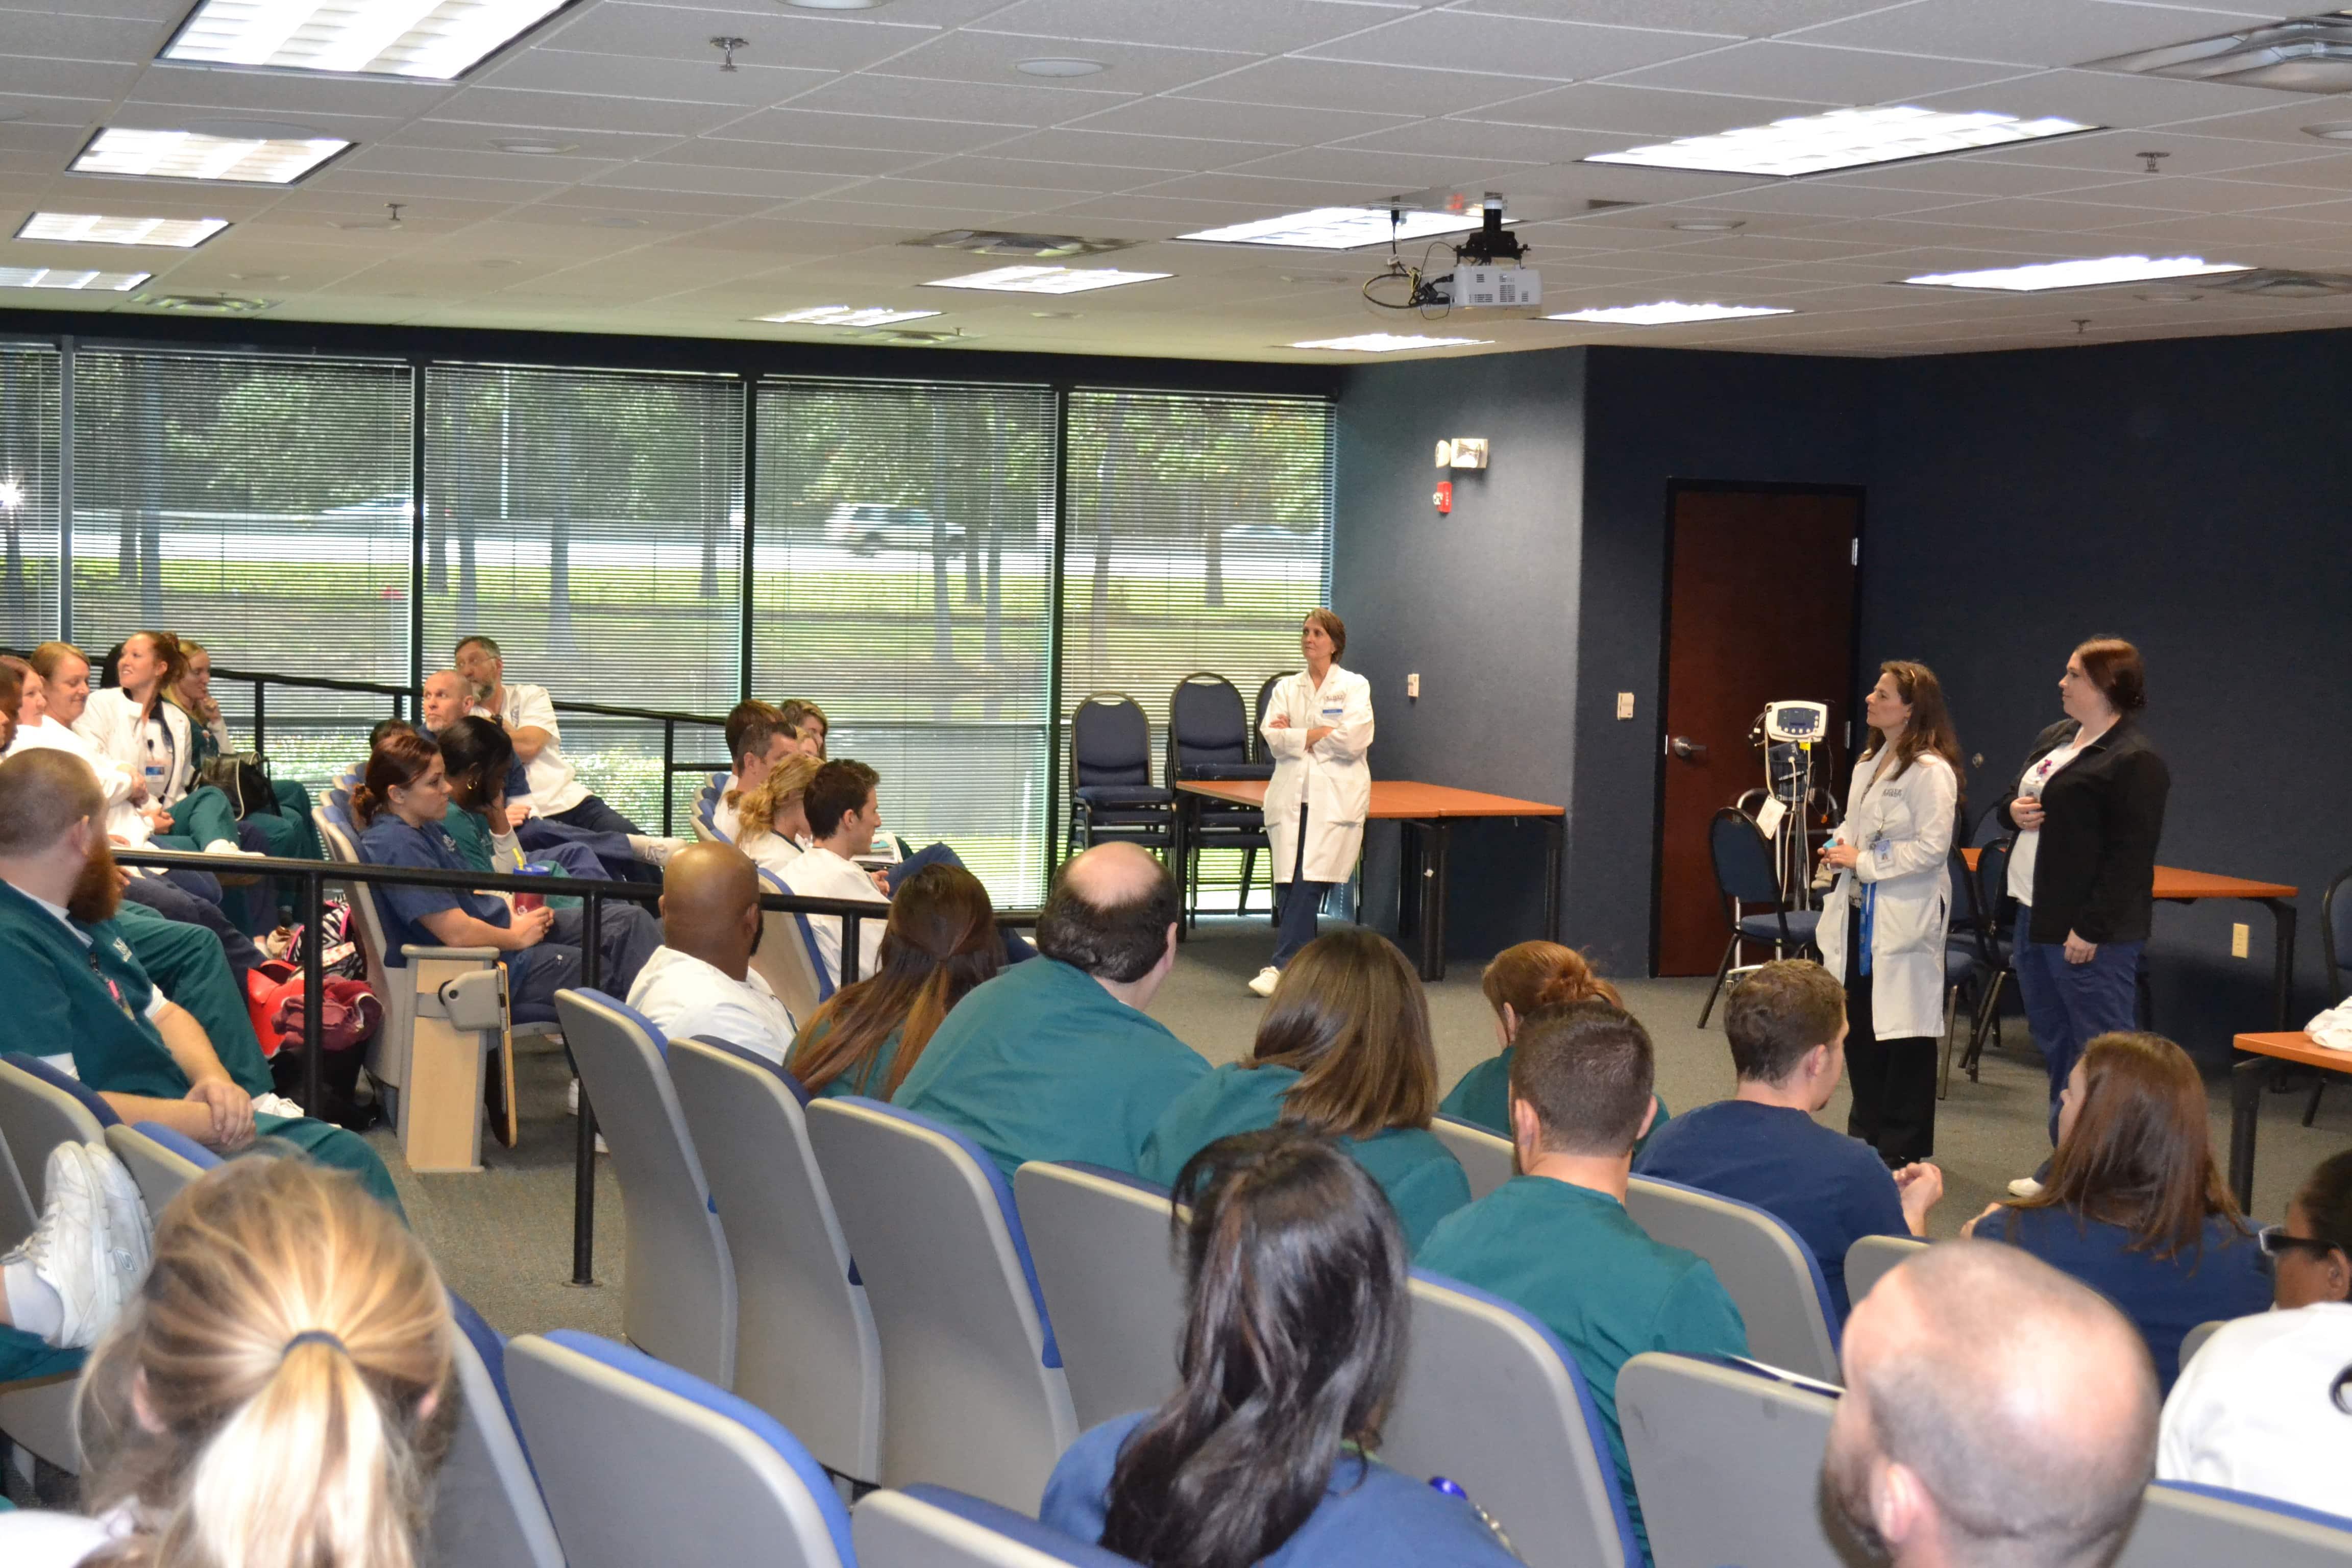 Jacksonville Holds an Allied Health Interdisciplinary Event